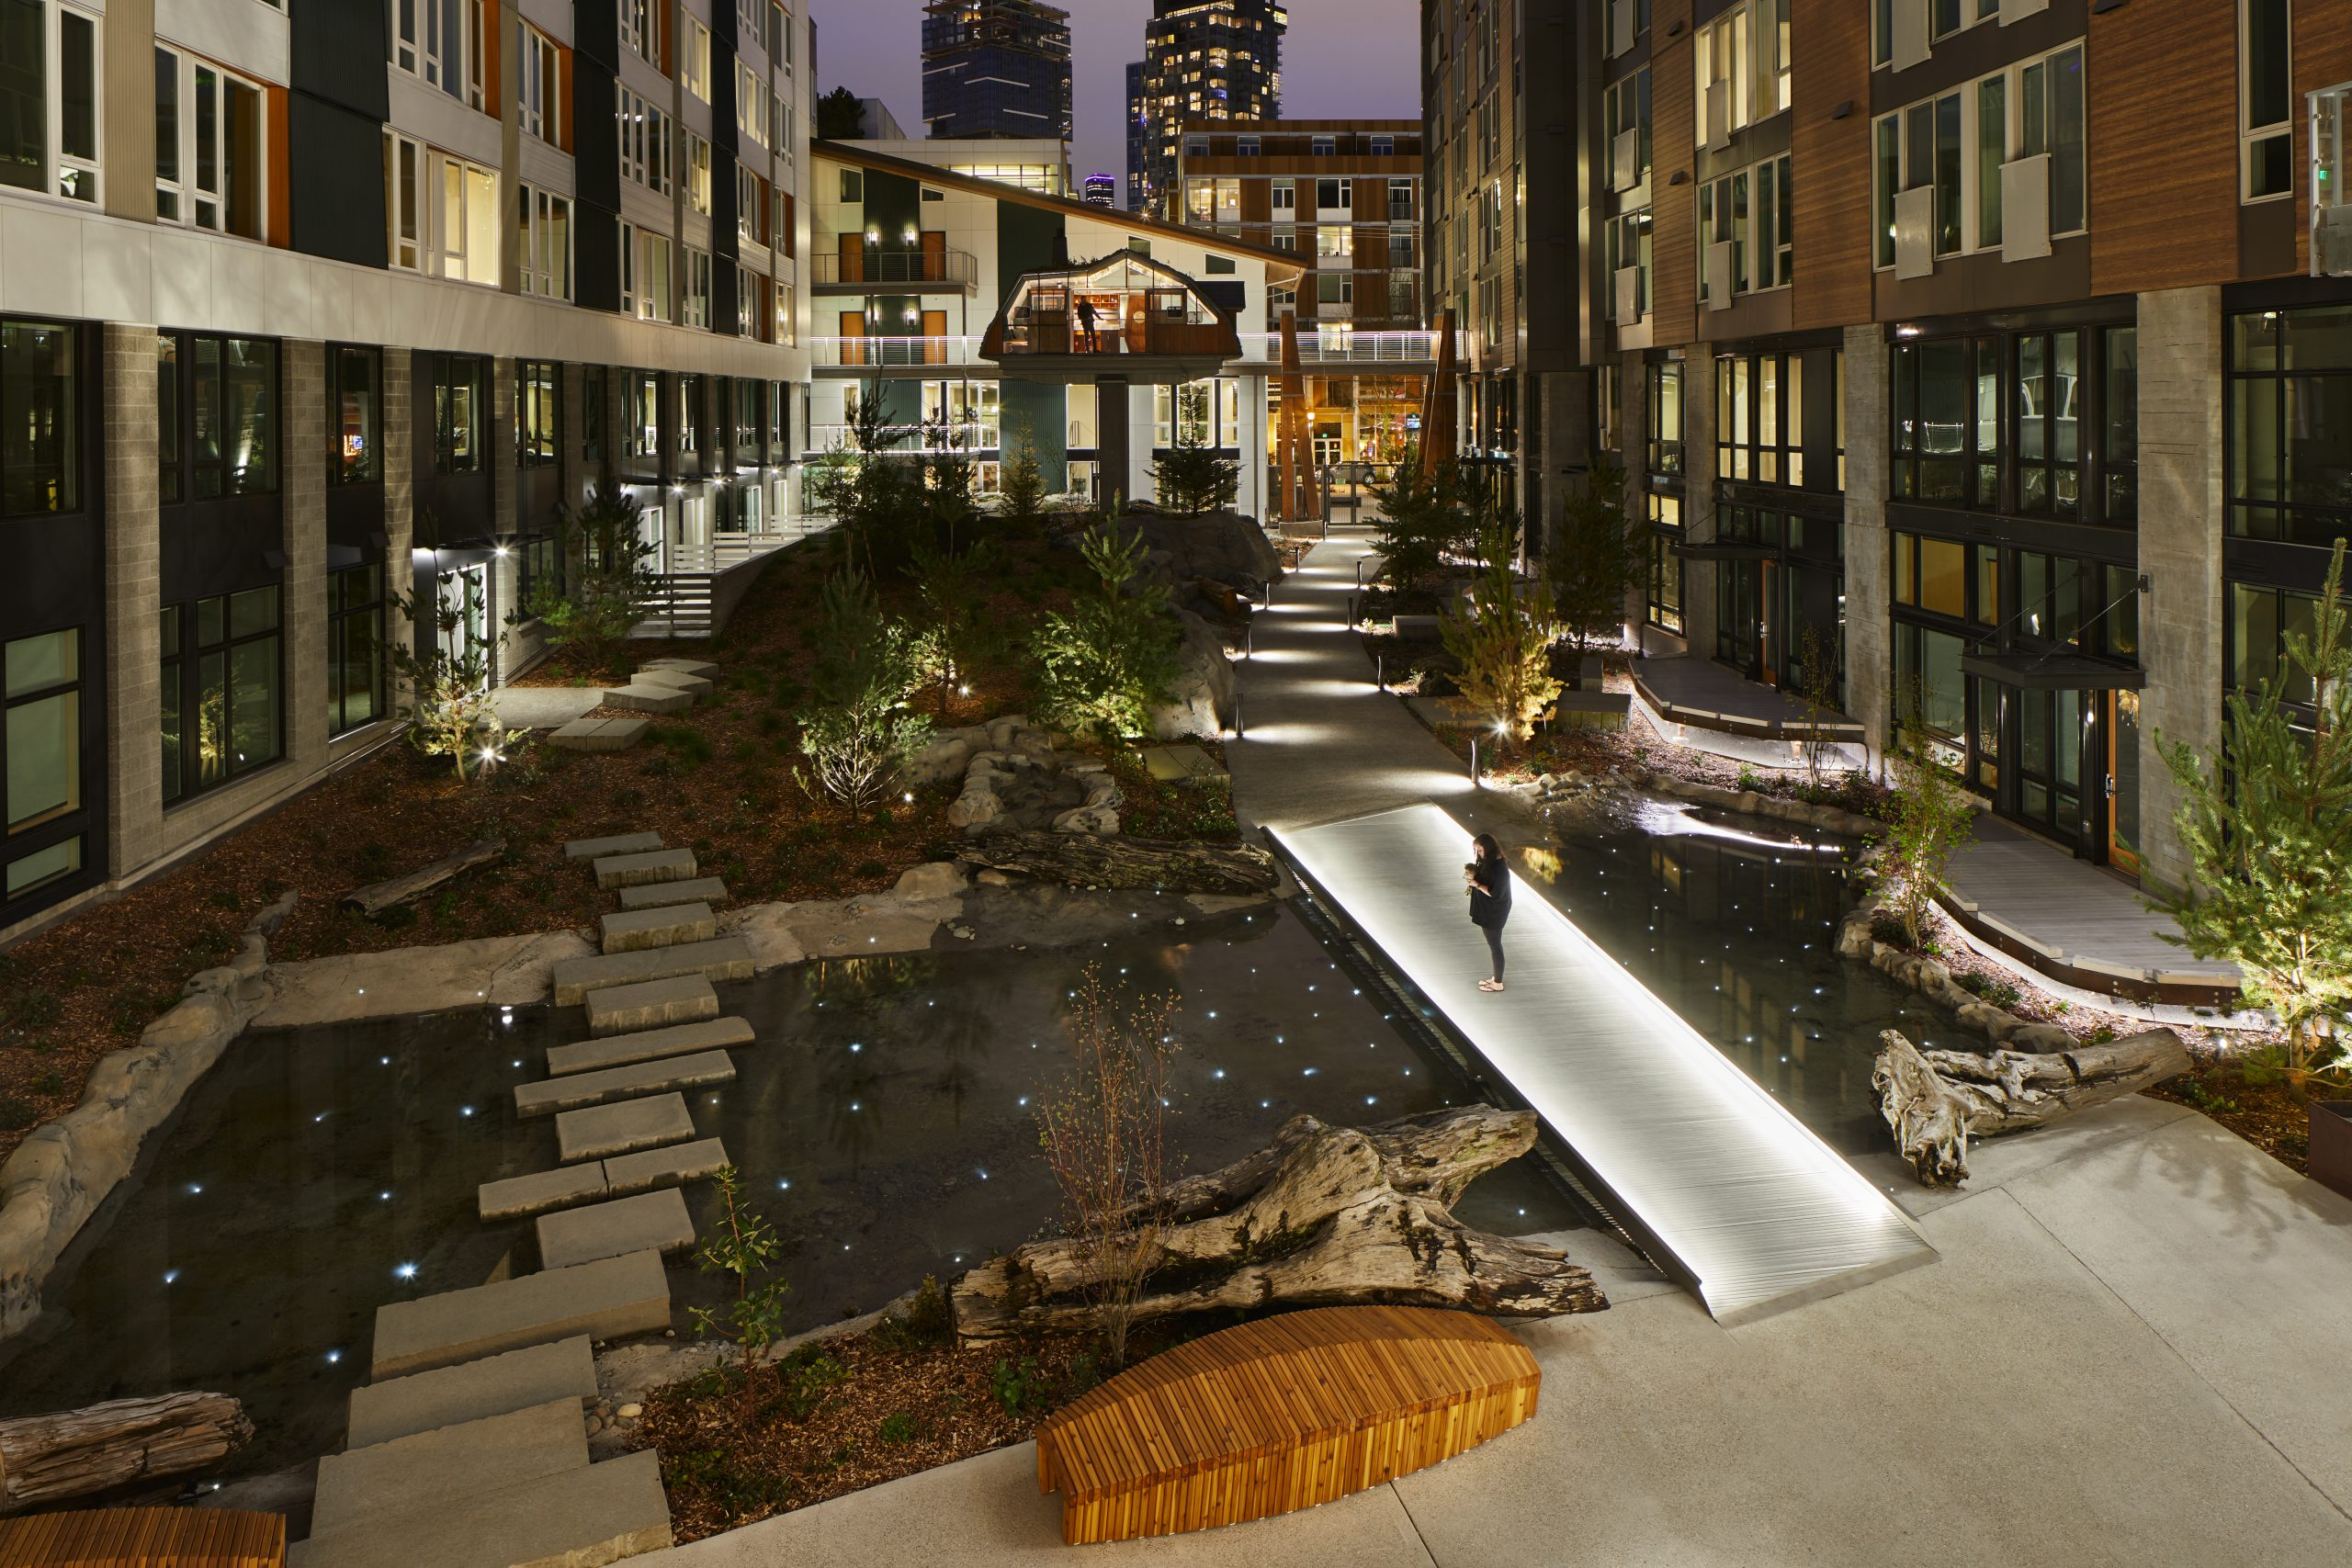 Sitka Courtyard - dusk